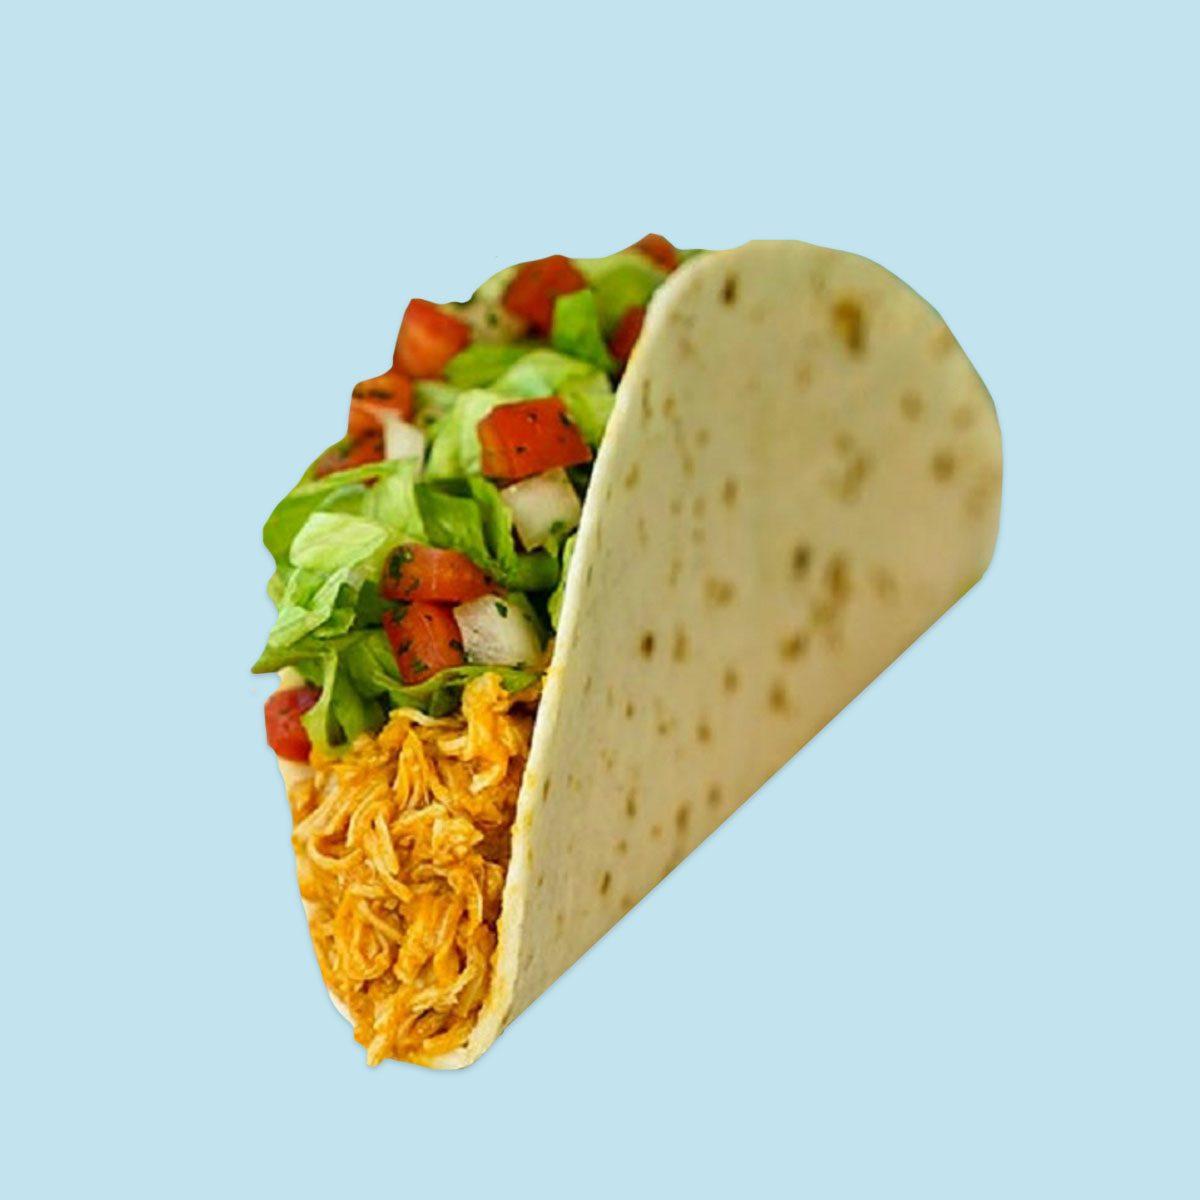 Taco Bell's Fresco-Style Soft Tacos